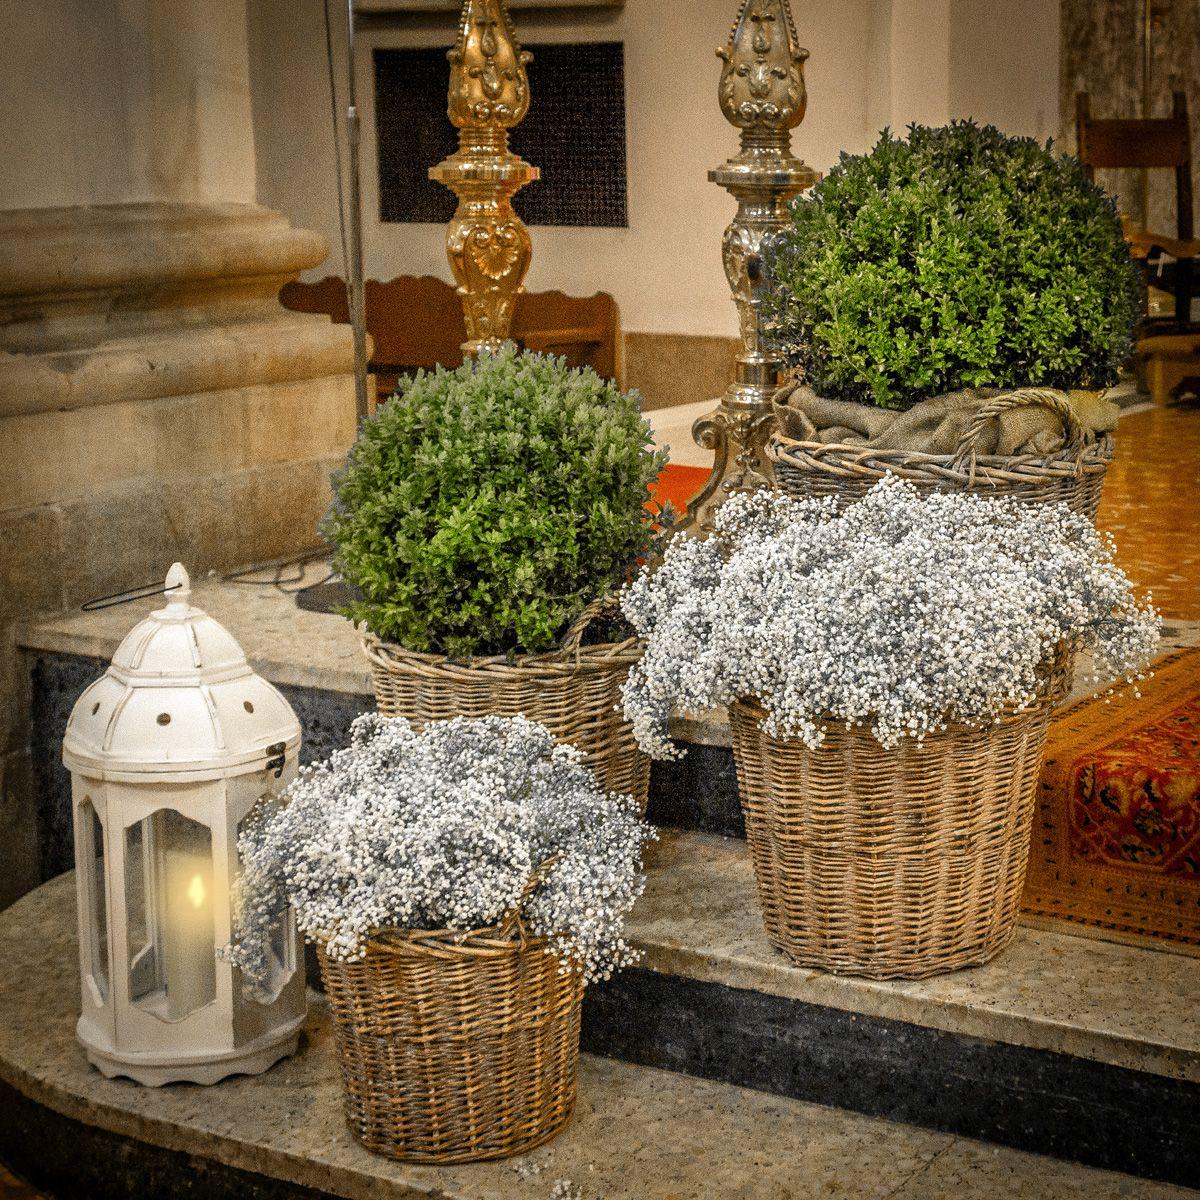 Boj paniculata y velas decoraci n ceremonia ramos for Decoracion boda exterior